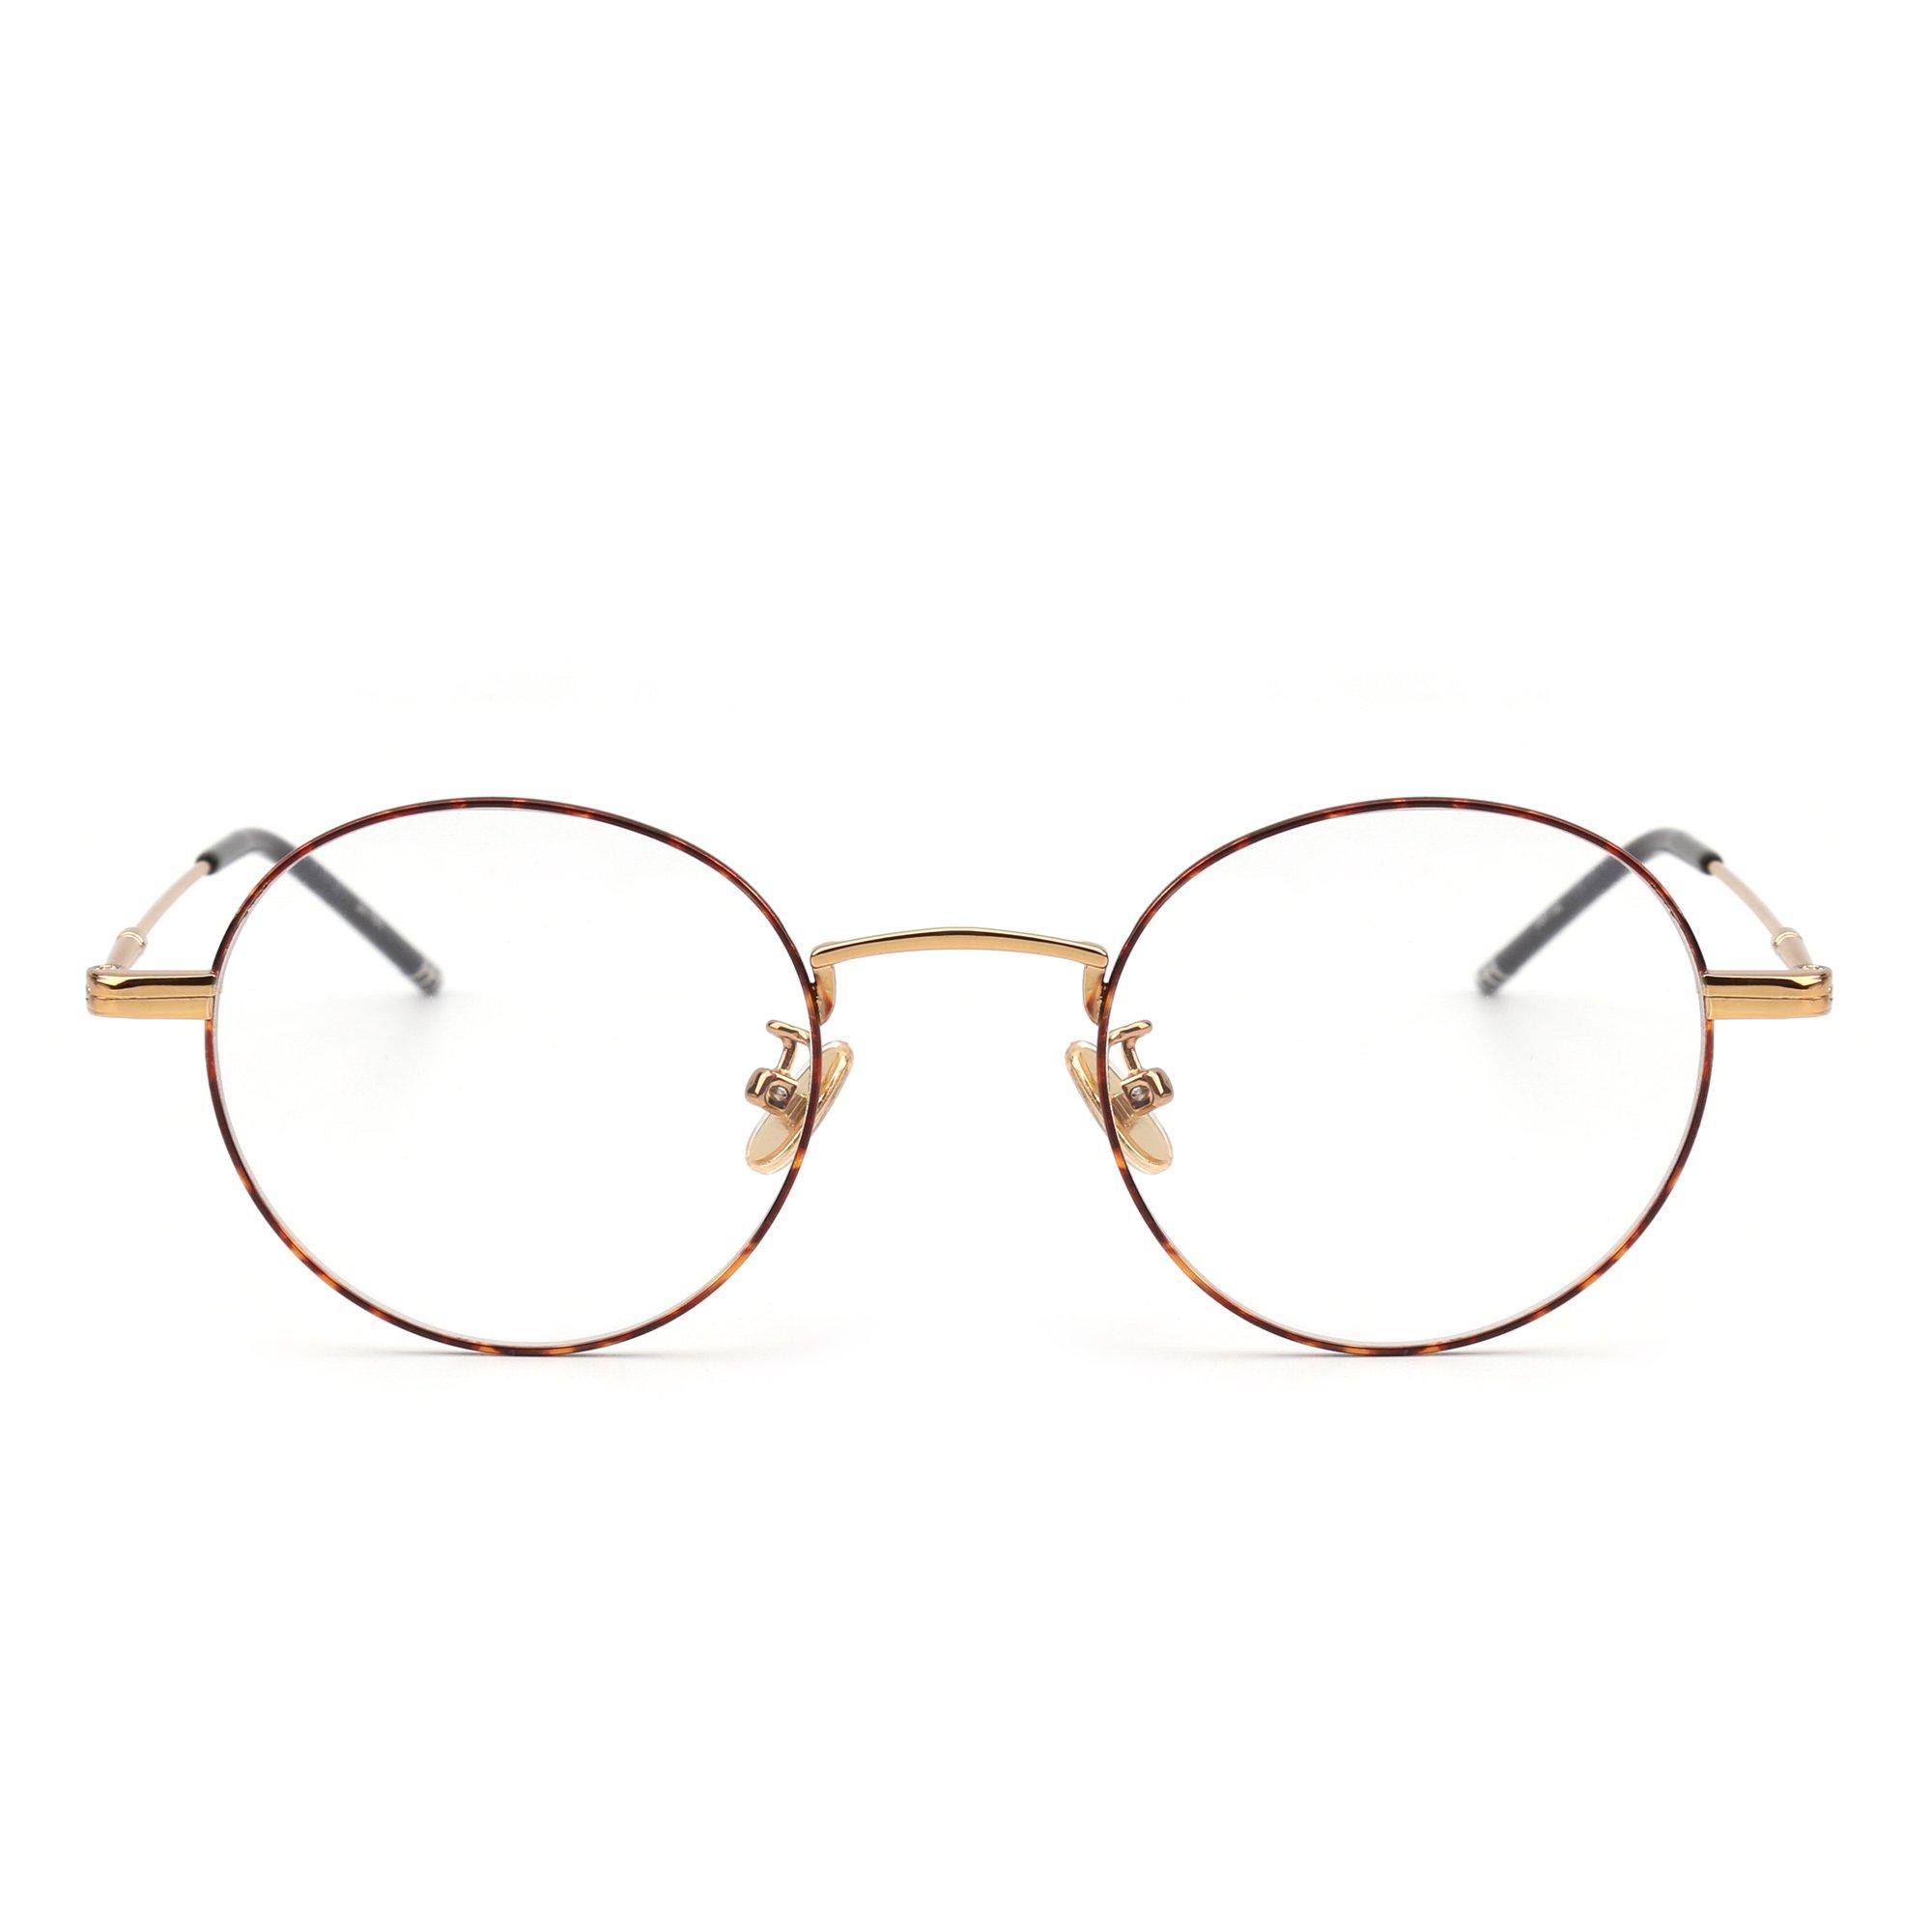 Round Wire Rim Glasses Circle Frame Clear Lens Eyeglasses Optical Eyewear Women Men (Gold / Clear)